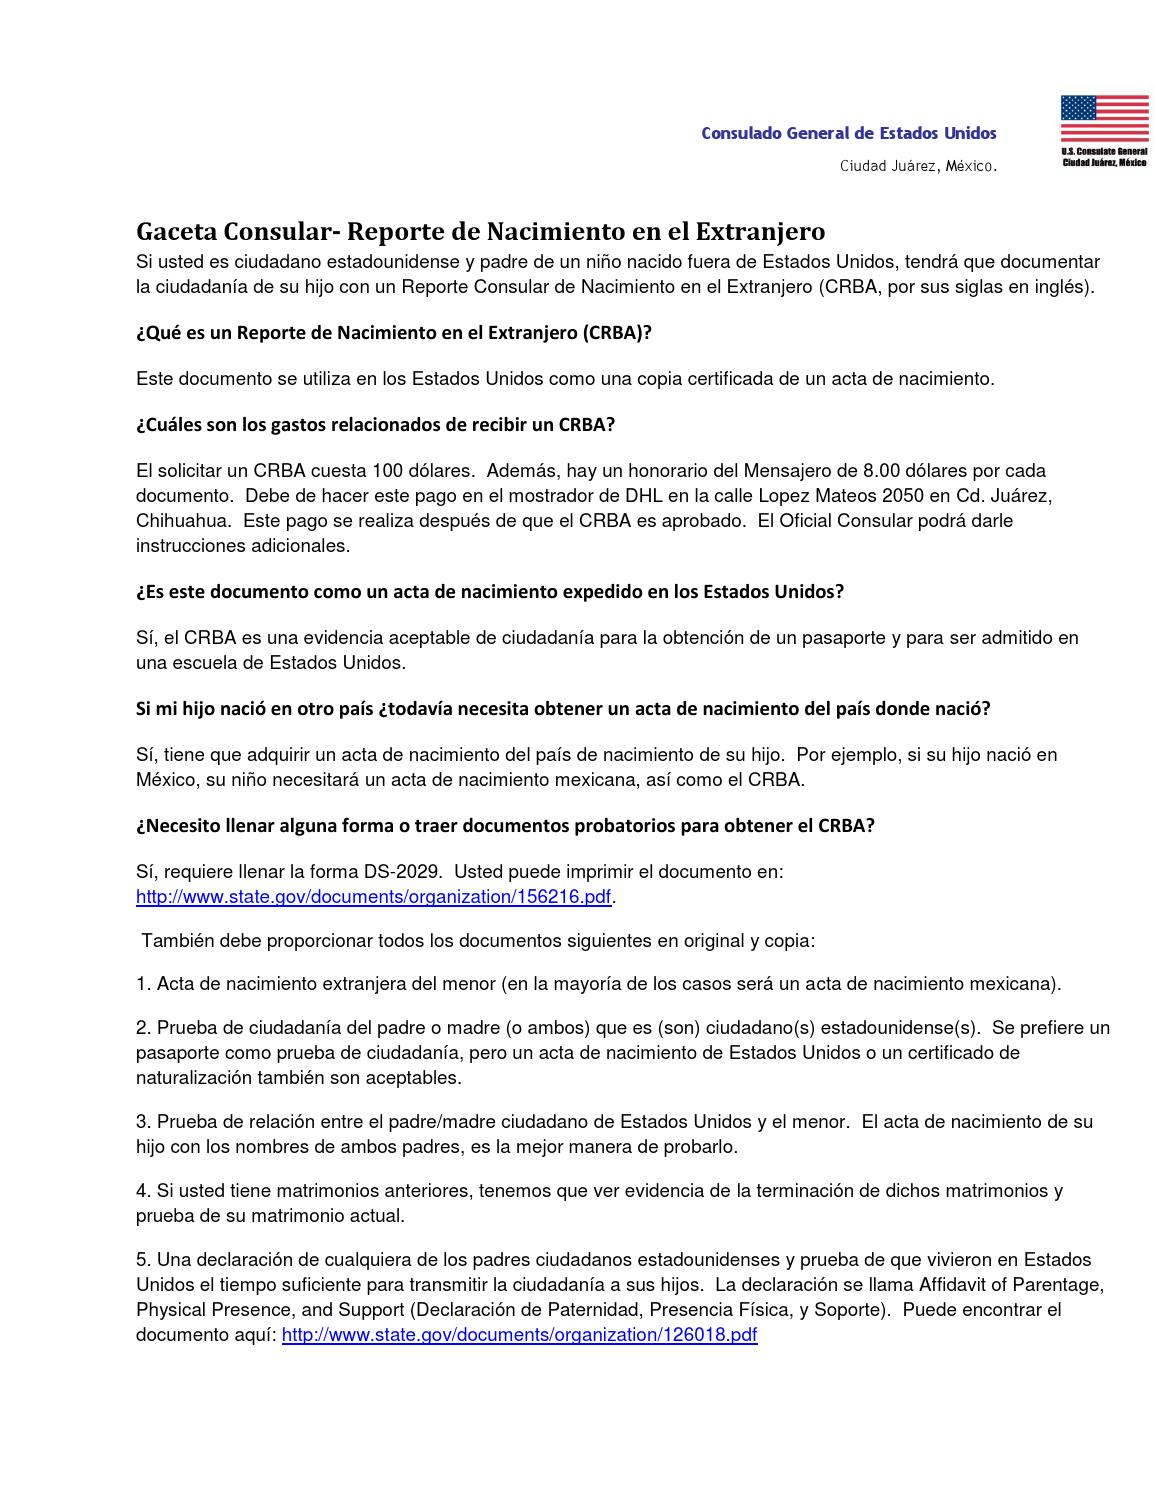 Gaceta consular USA crba by becasyprogramas chihuahua - issuu